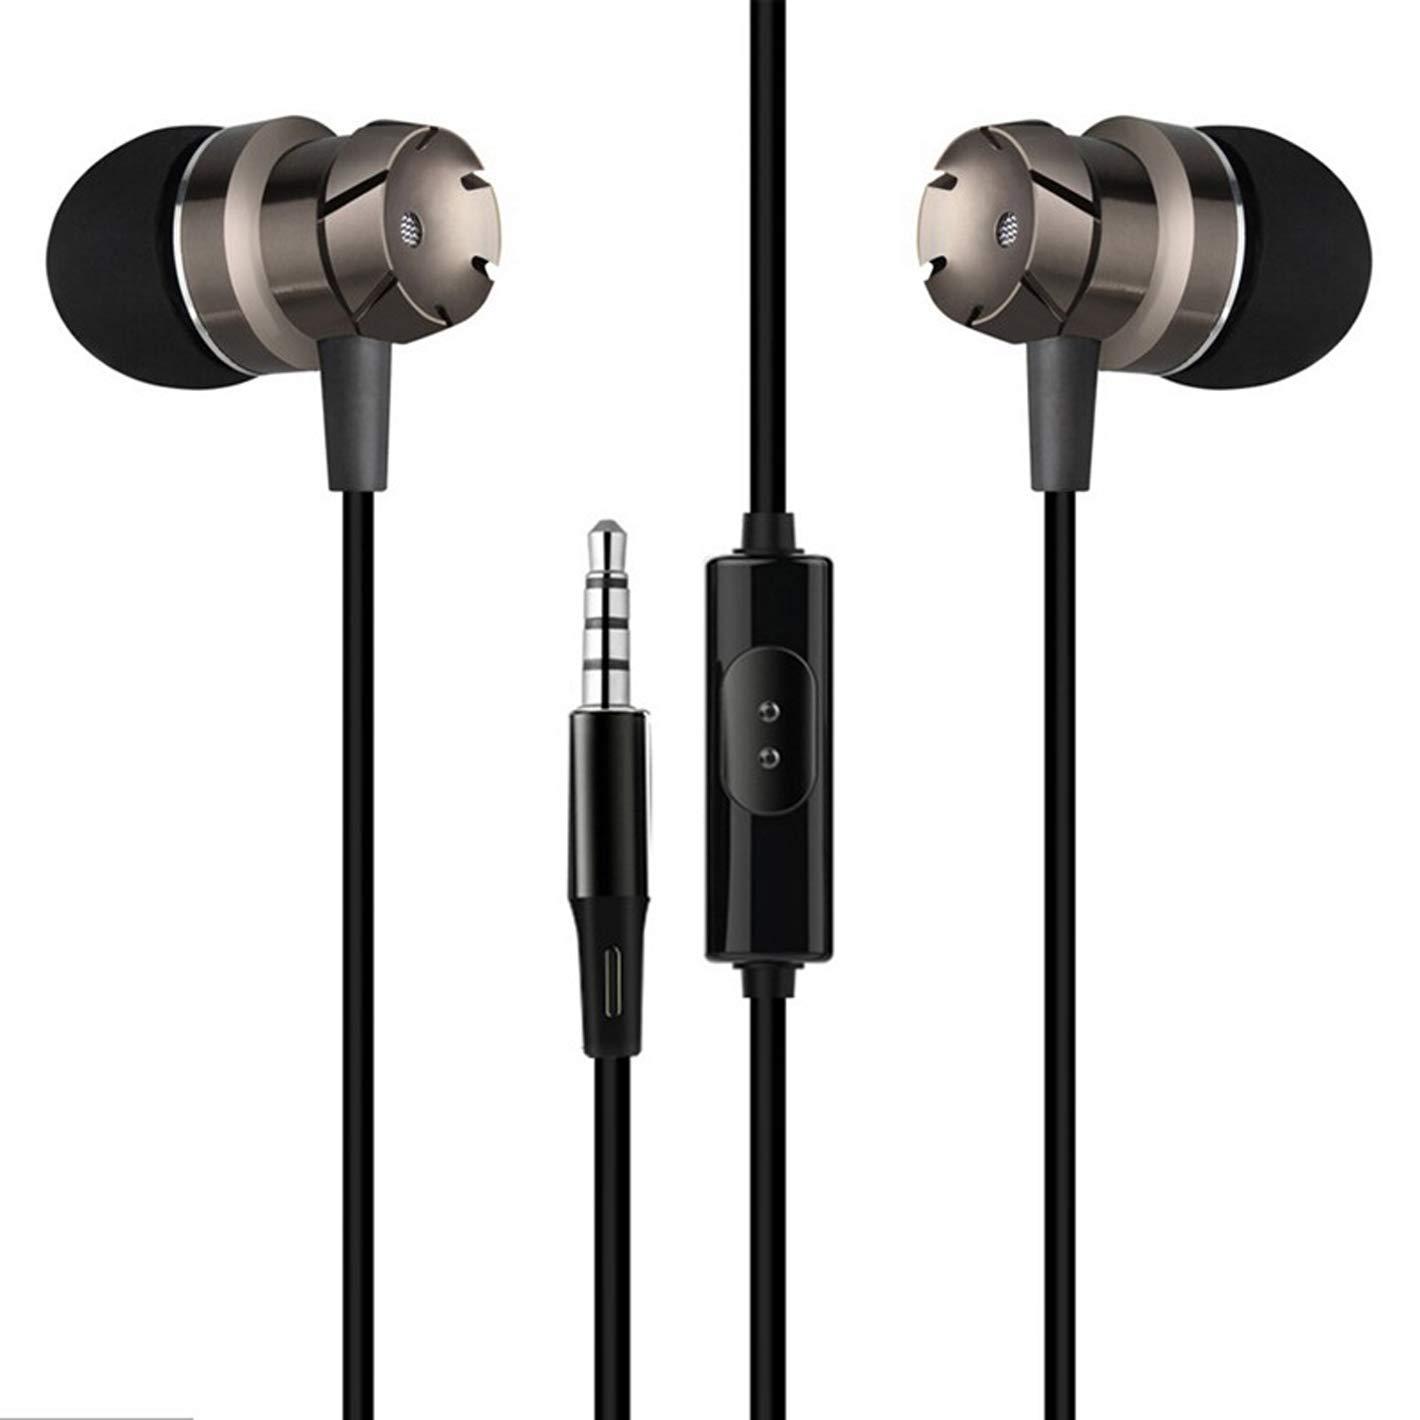 3.5mm Earphones, in-Ear Sweatproof Headphones with Mic, Sweatproof Earbuds for Gym Running